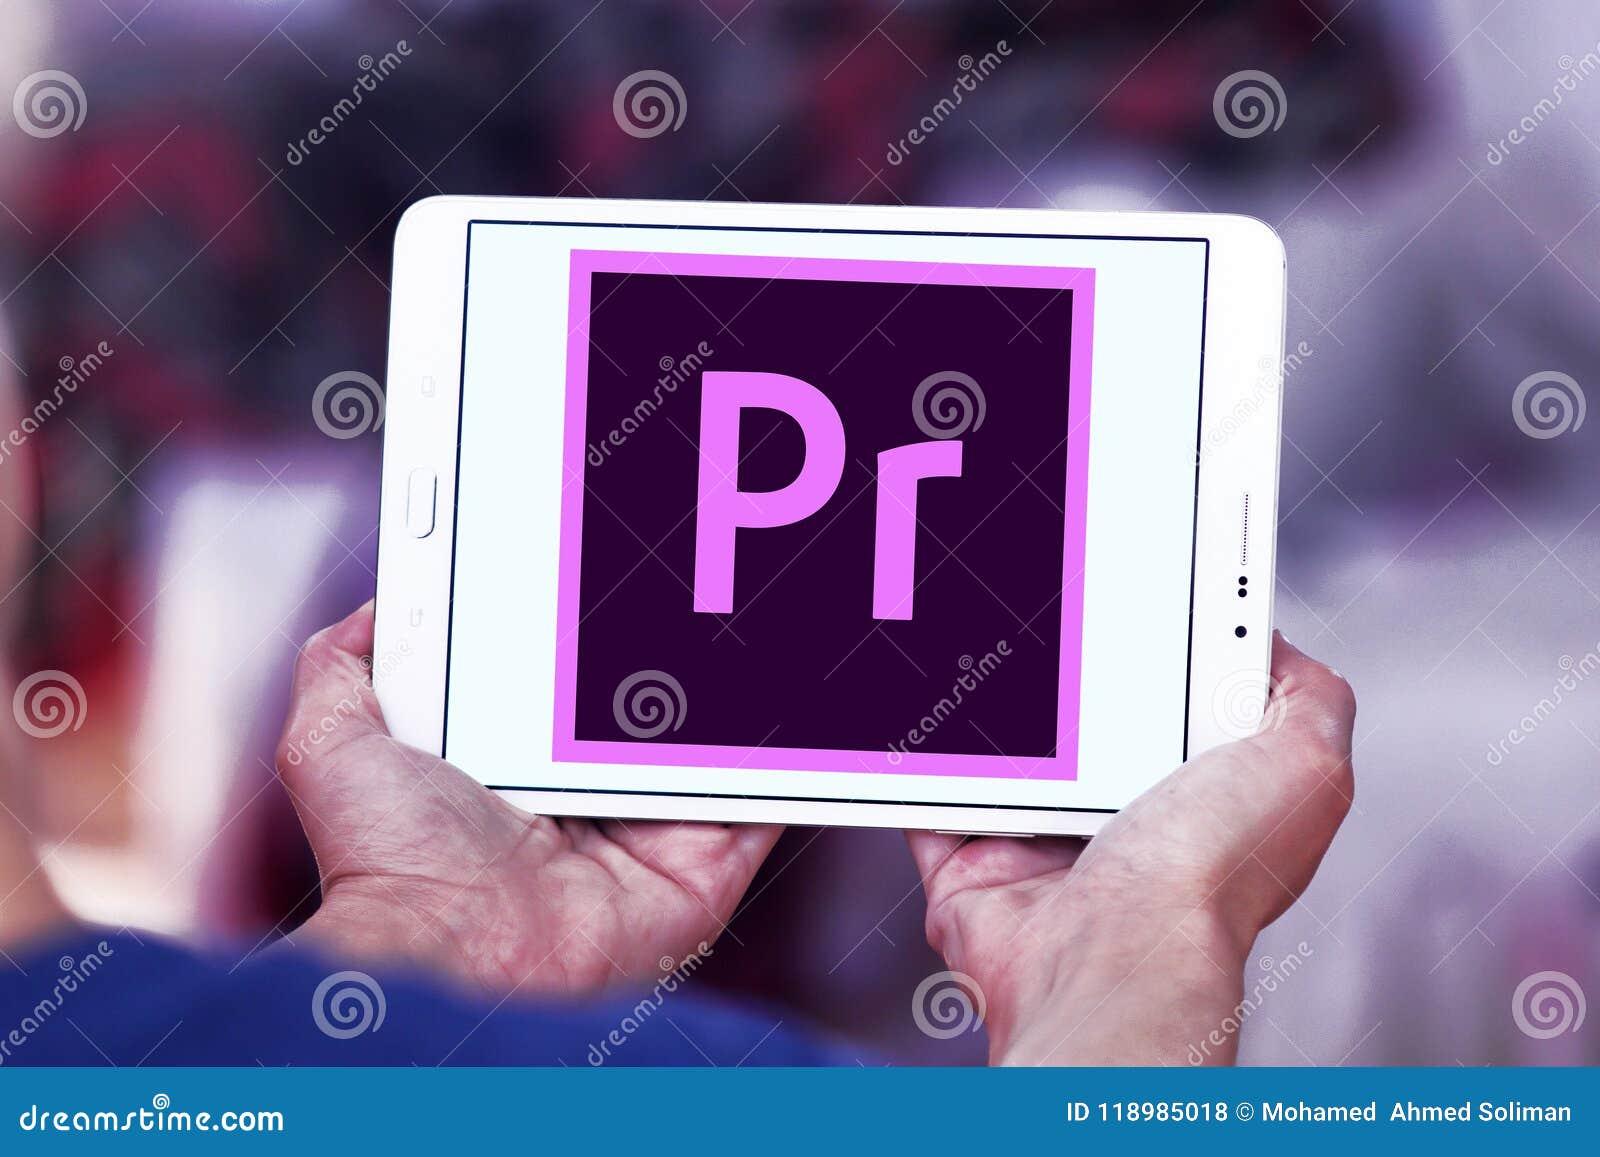 Adobe Premiere Pro logo editorial stock photo  Image of sign - 118985018